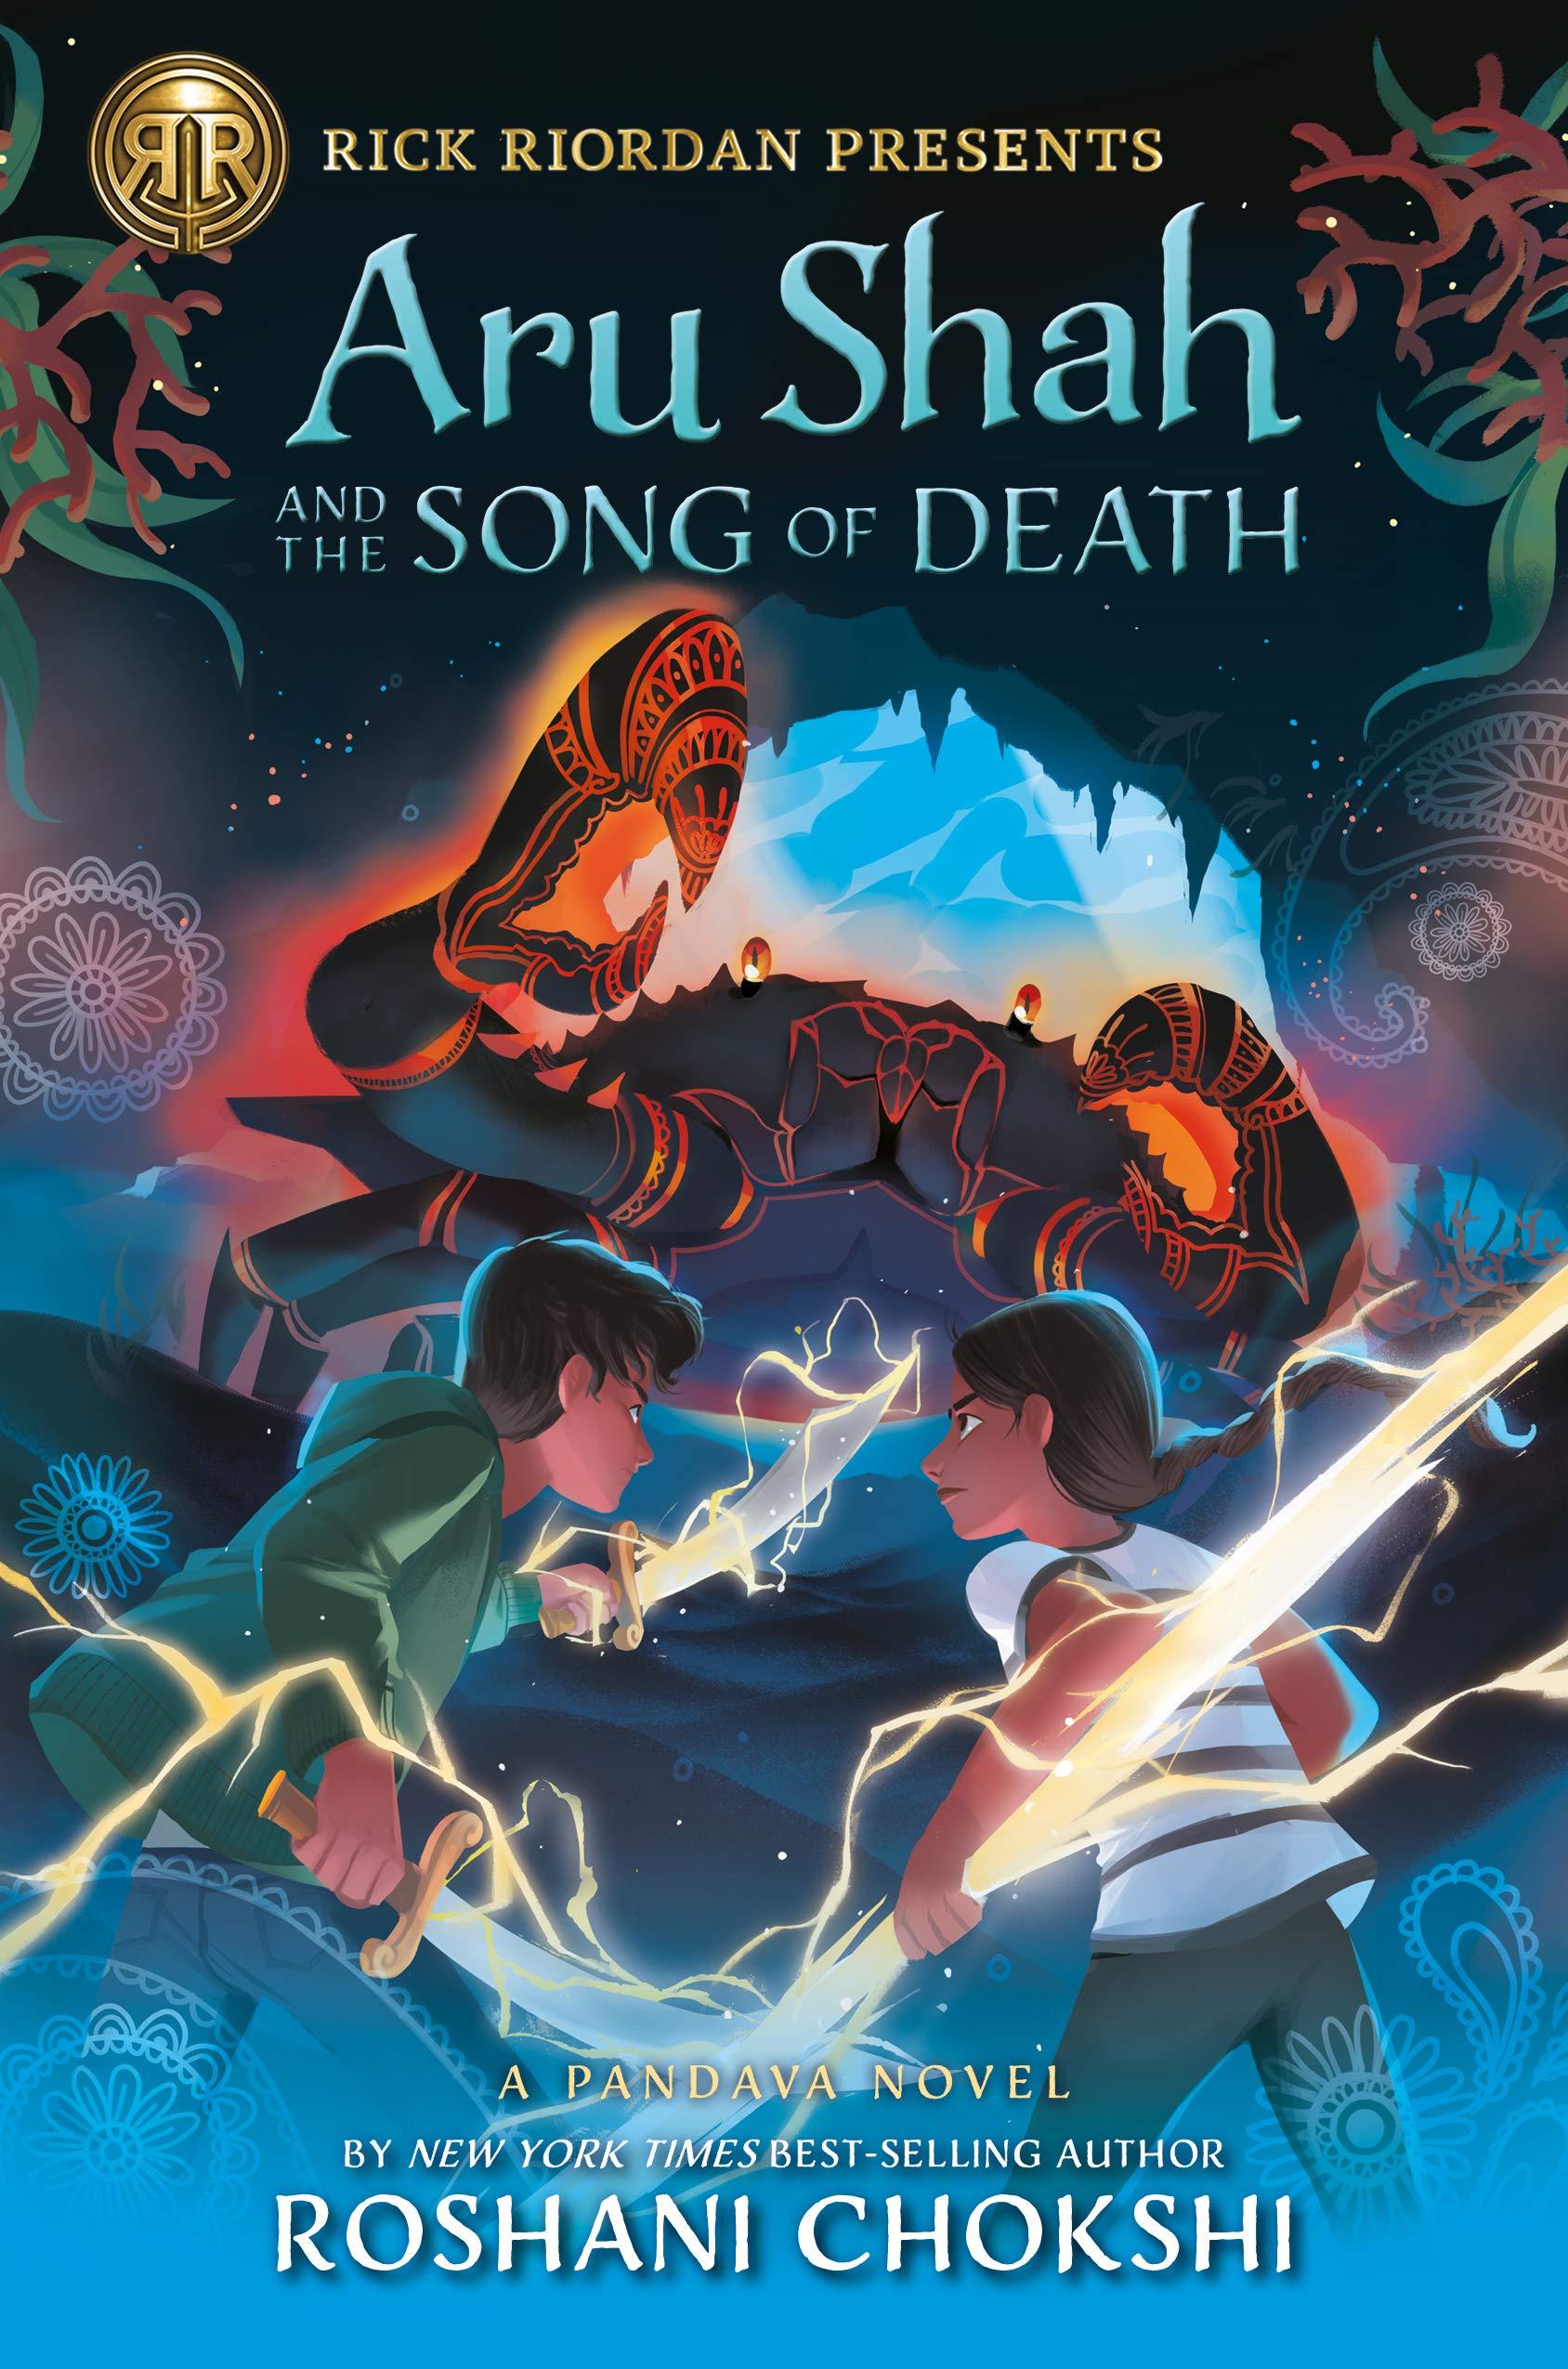 Aru Shah and the Song of Death (A Pandava Novel Book 2) (Pandava Series  (2)): Chokshi, Roshani: 9781368013840: Amazon.com: Books